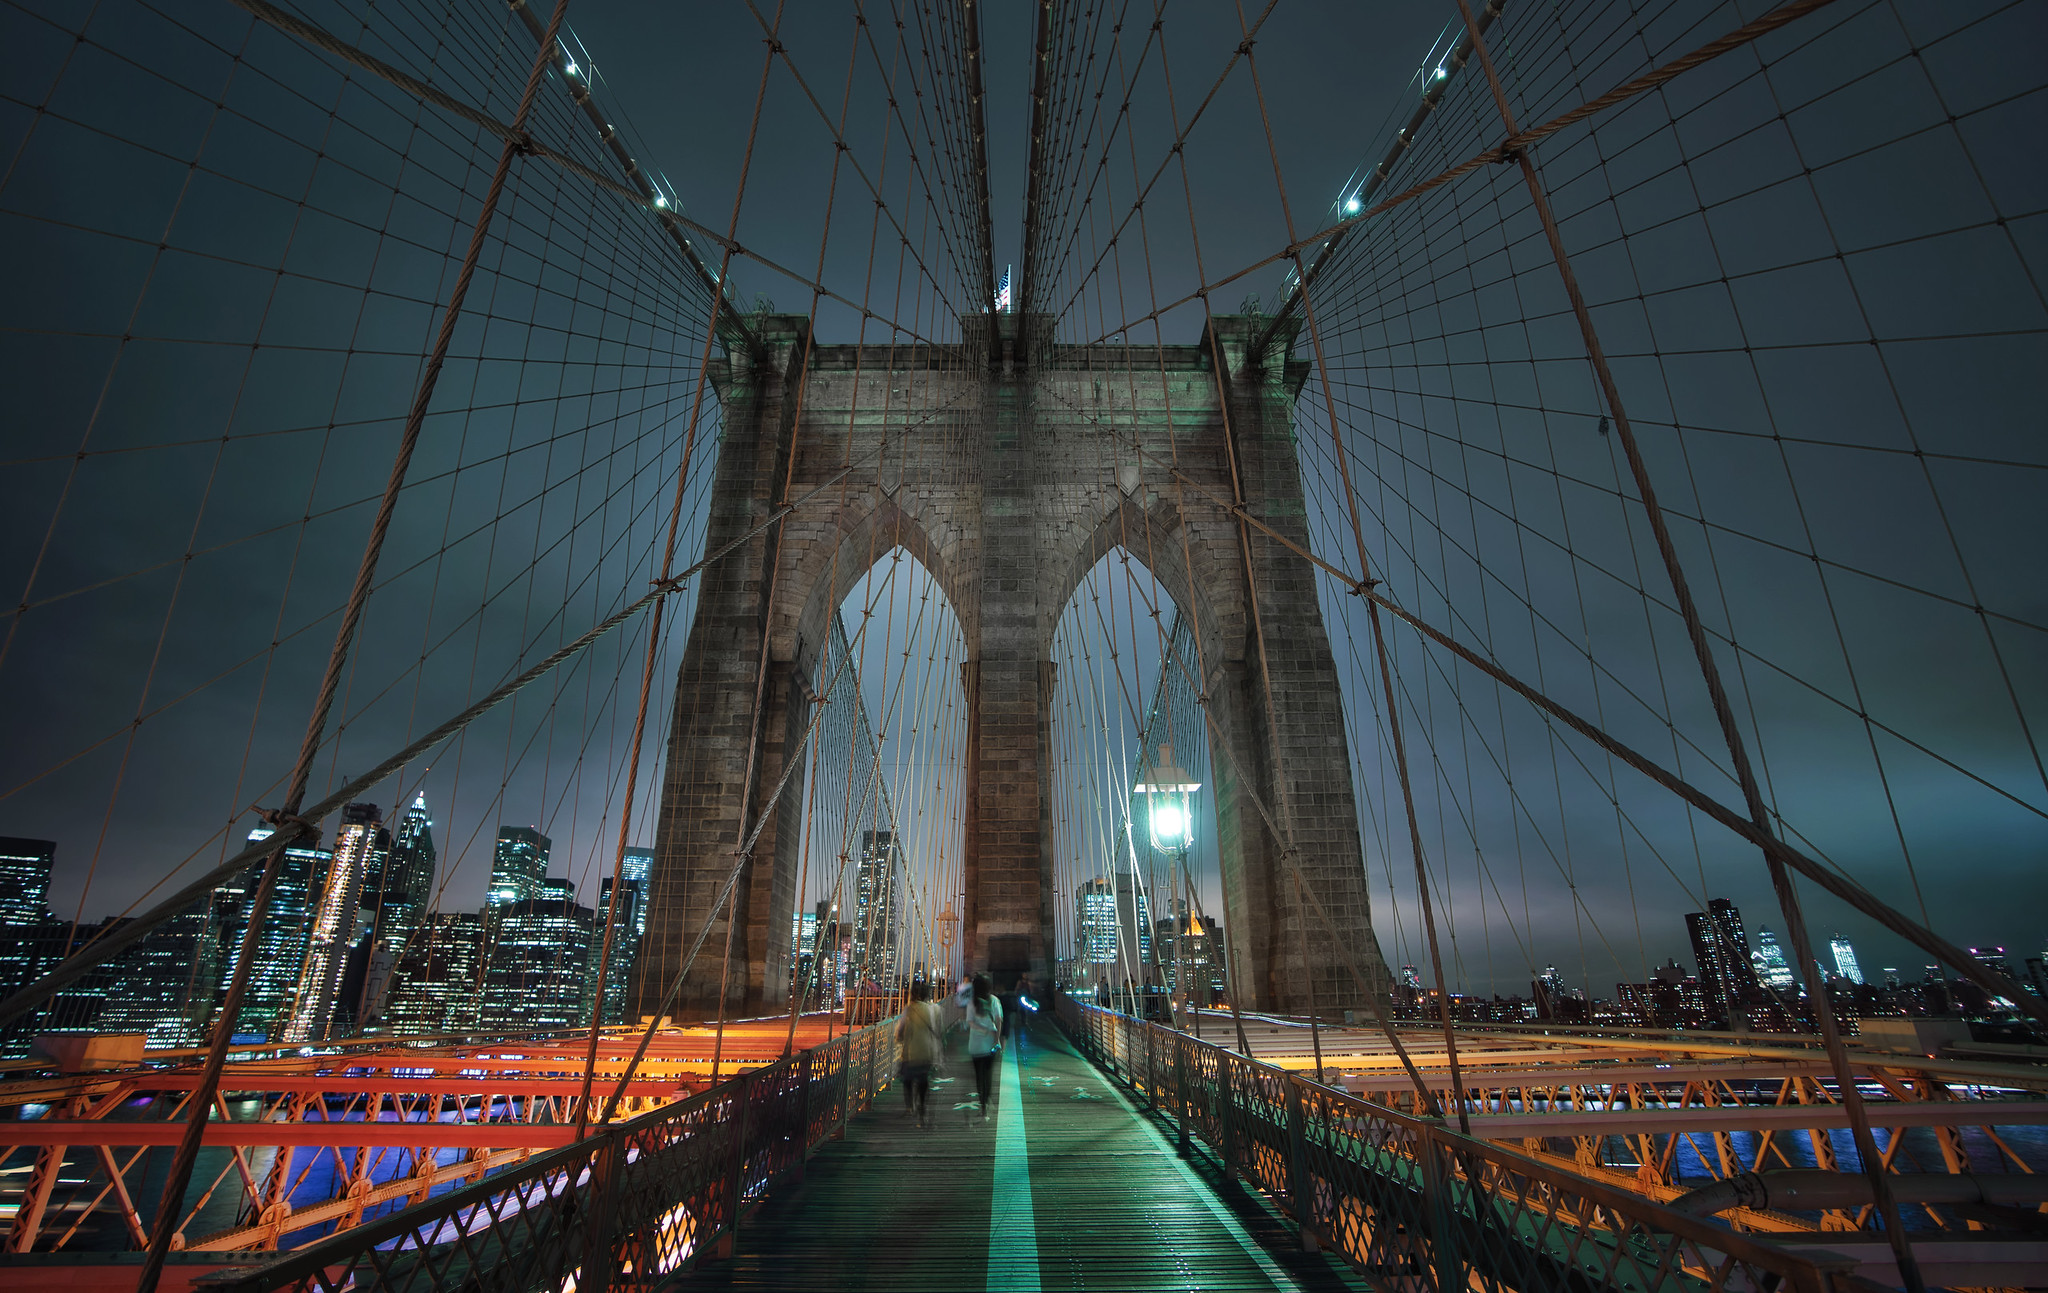 Strolling on the Brooklyn Bridge